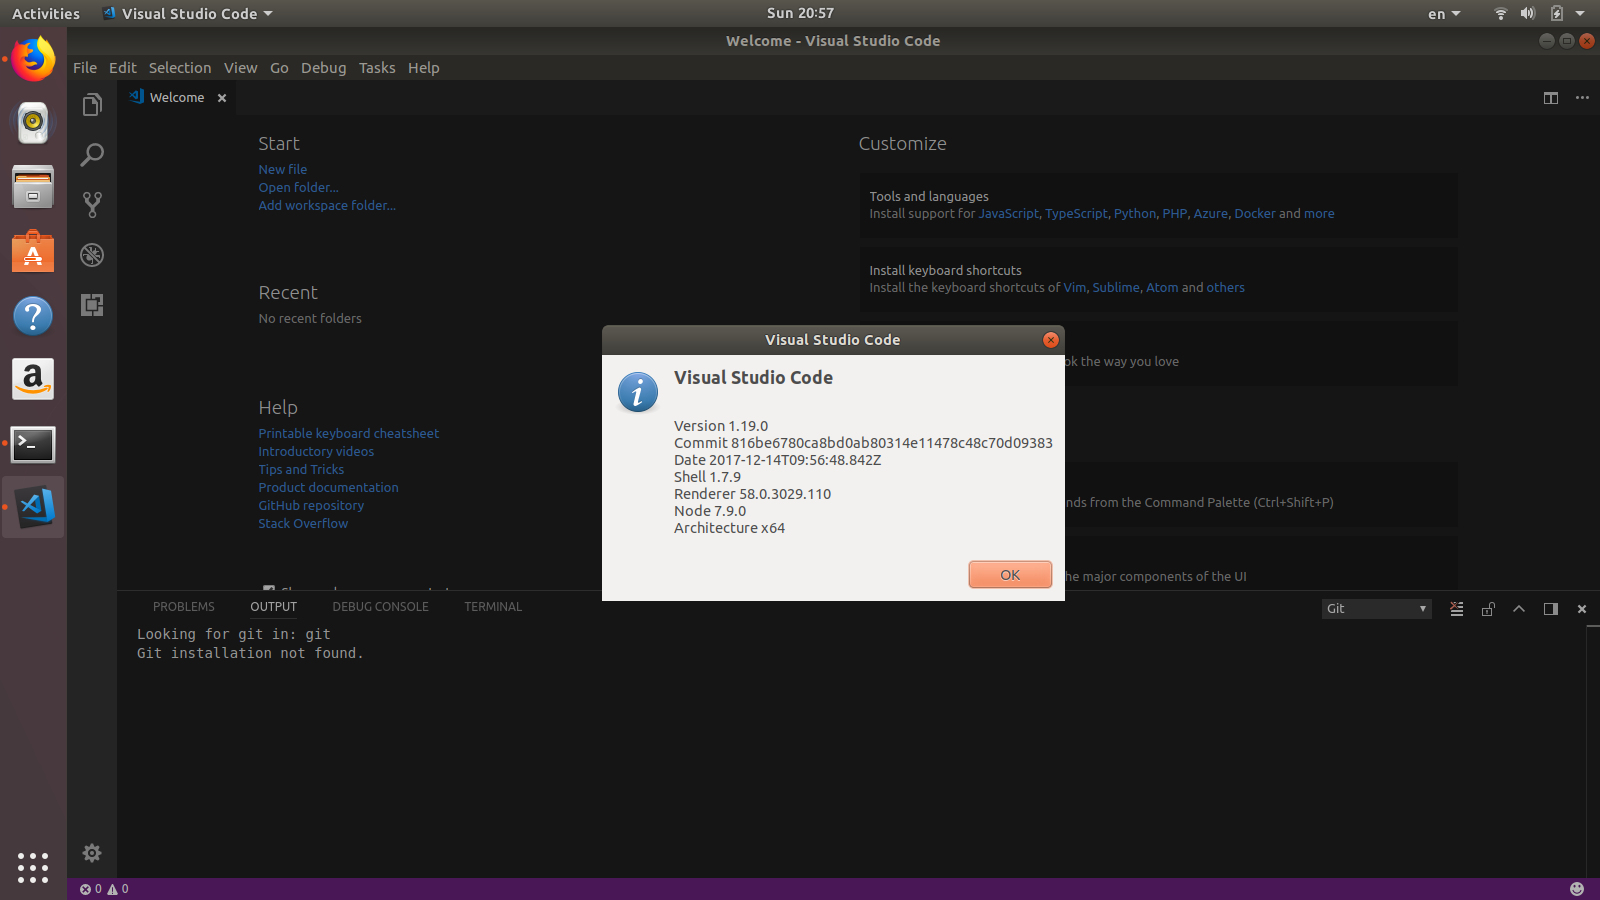 How to install program on Ubuntu: How to install Visual